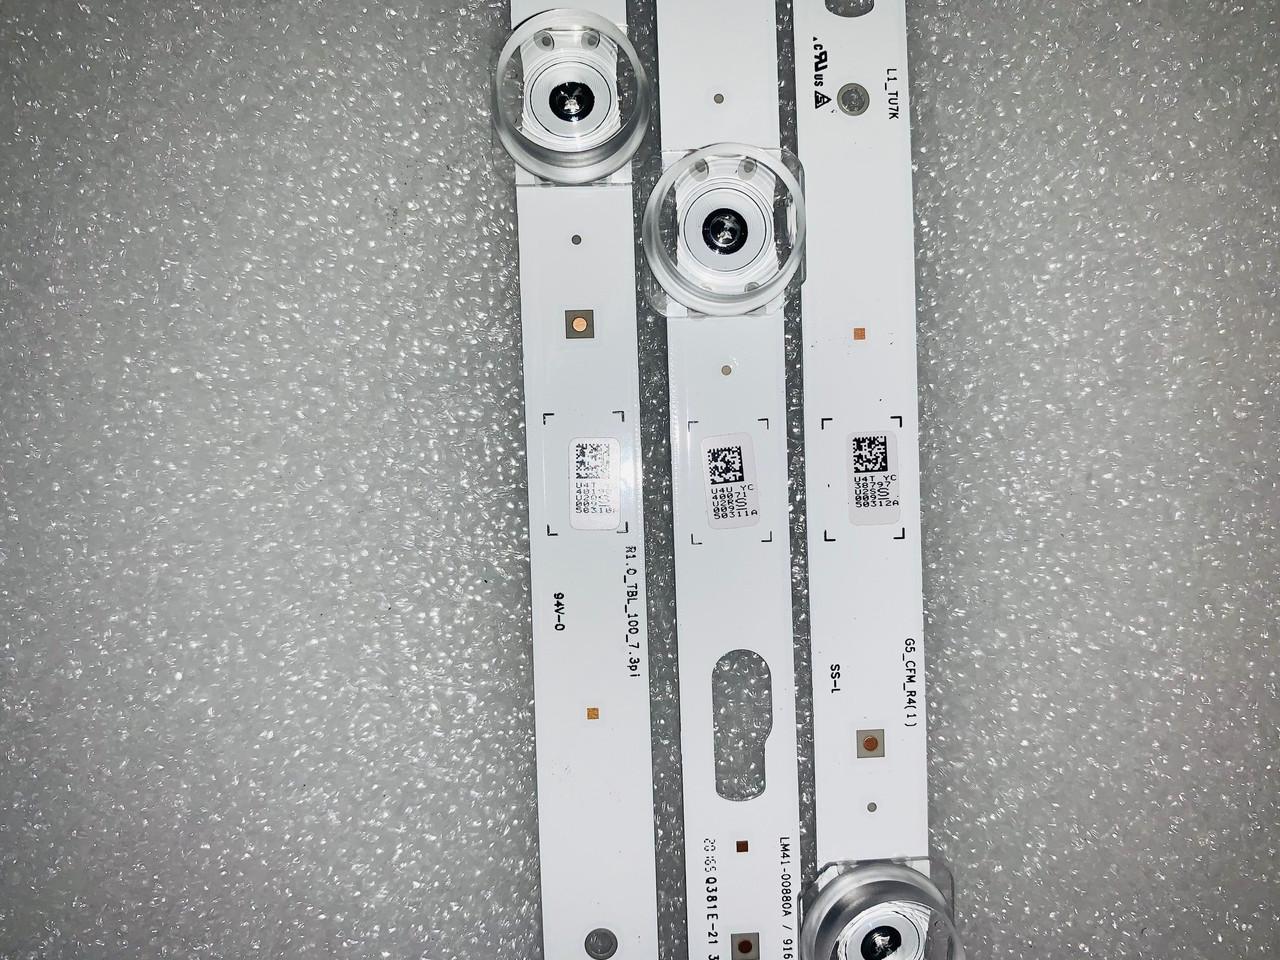 Samsung UN75TU7000F LED light strips set of 18 BN96-50310A & BN96-50311A & BN96-50312A